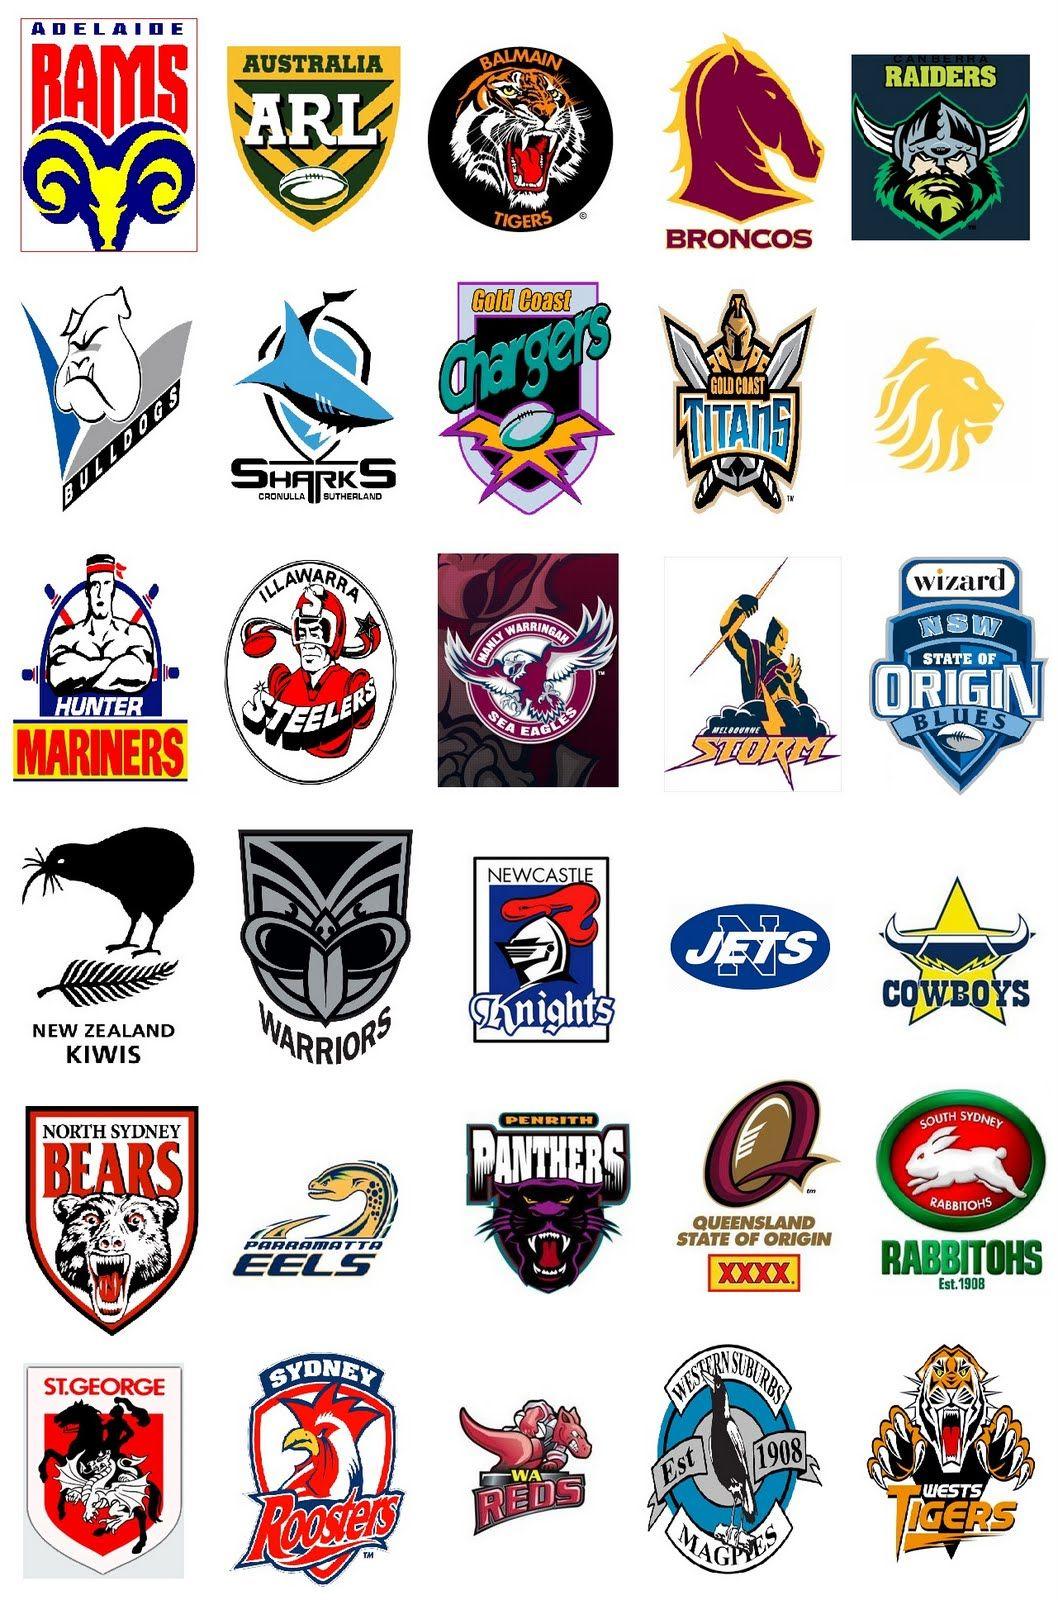 Pin on Rugby Logos & Art